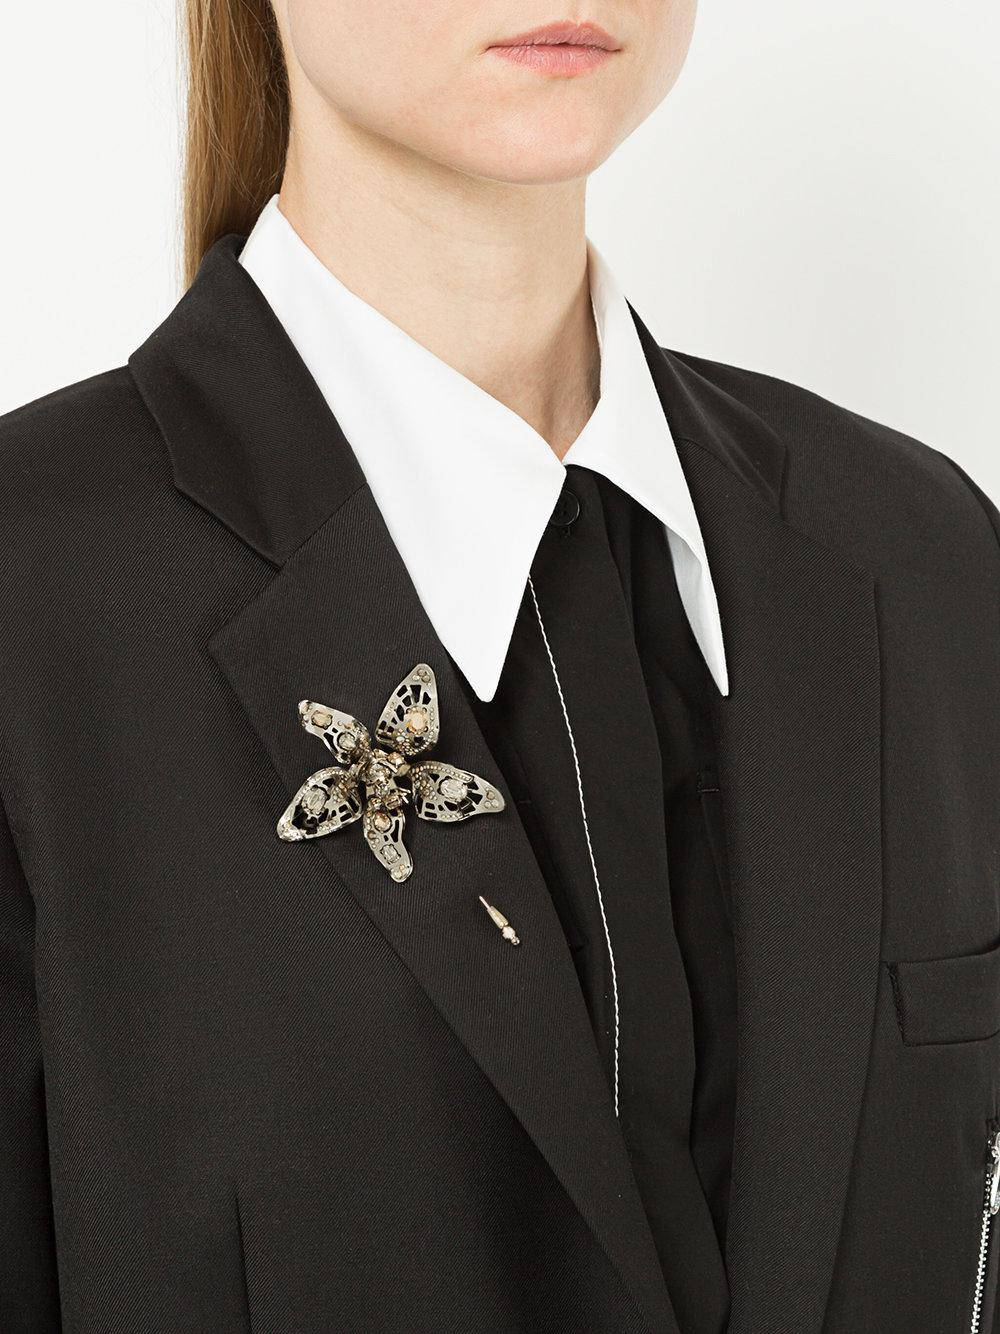 Lanvin Leather Crystal-embellished Flower Brooch in Metallic